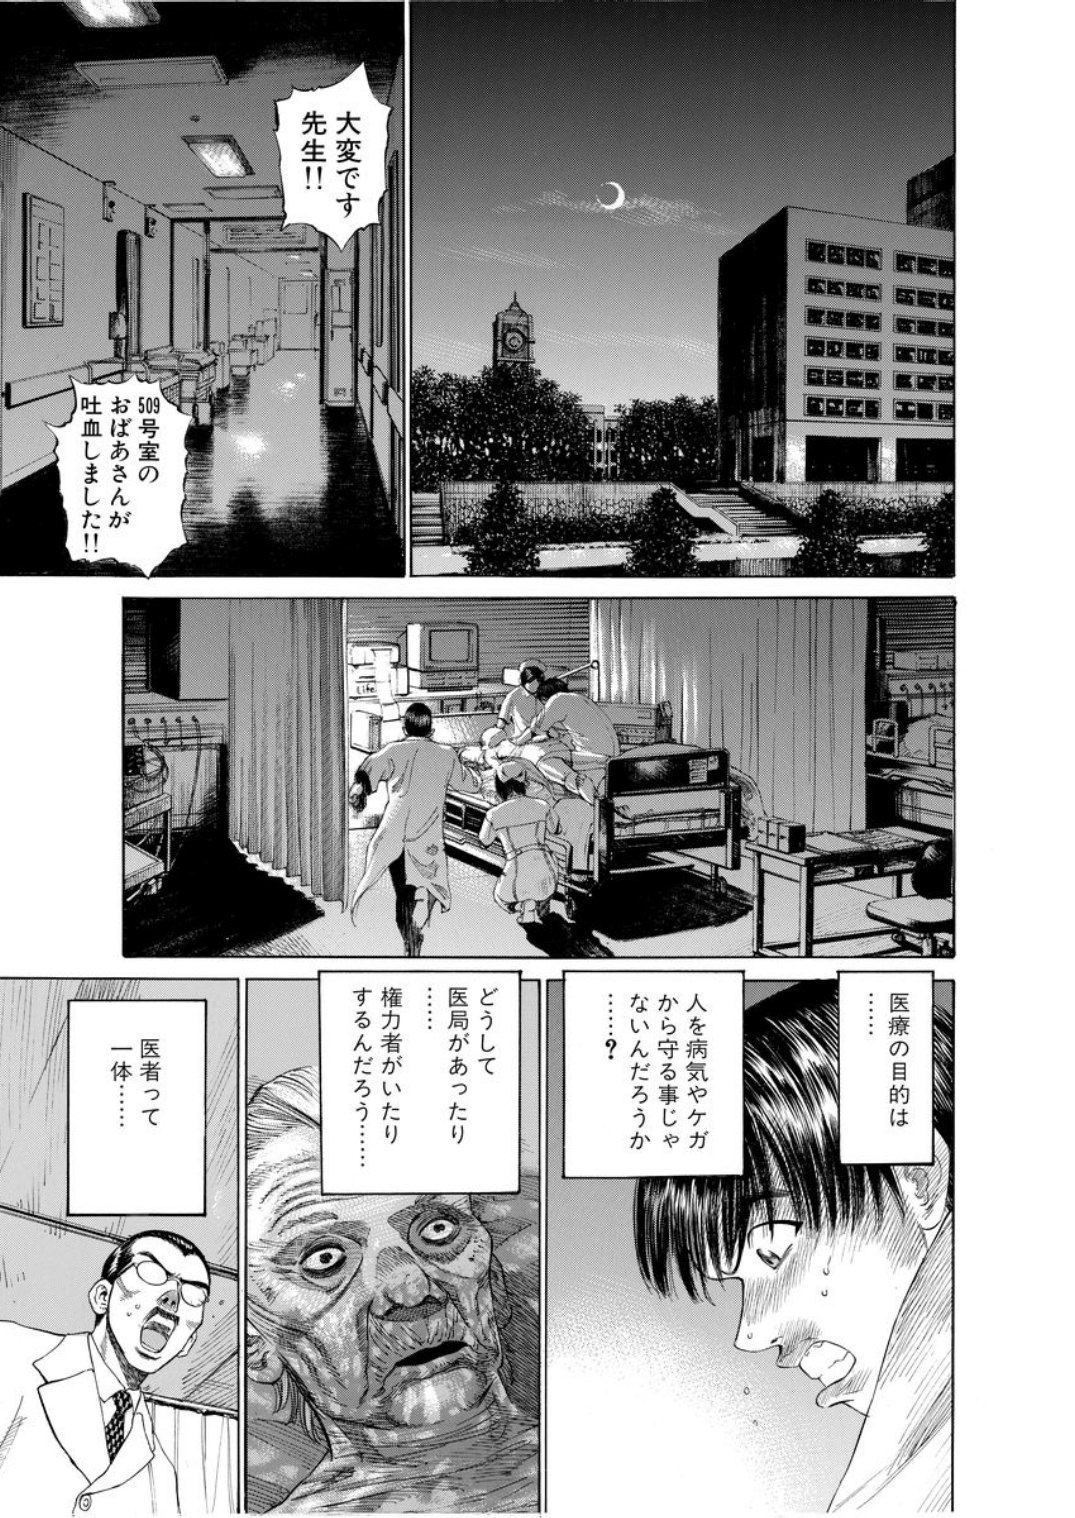 001bj_page-0157.jpg